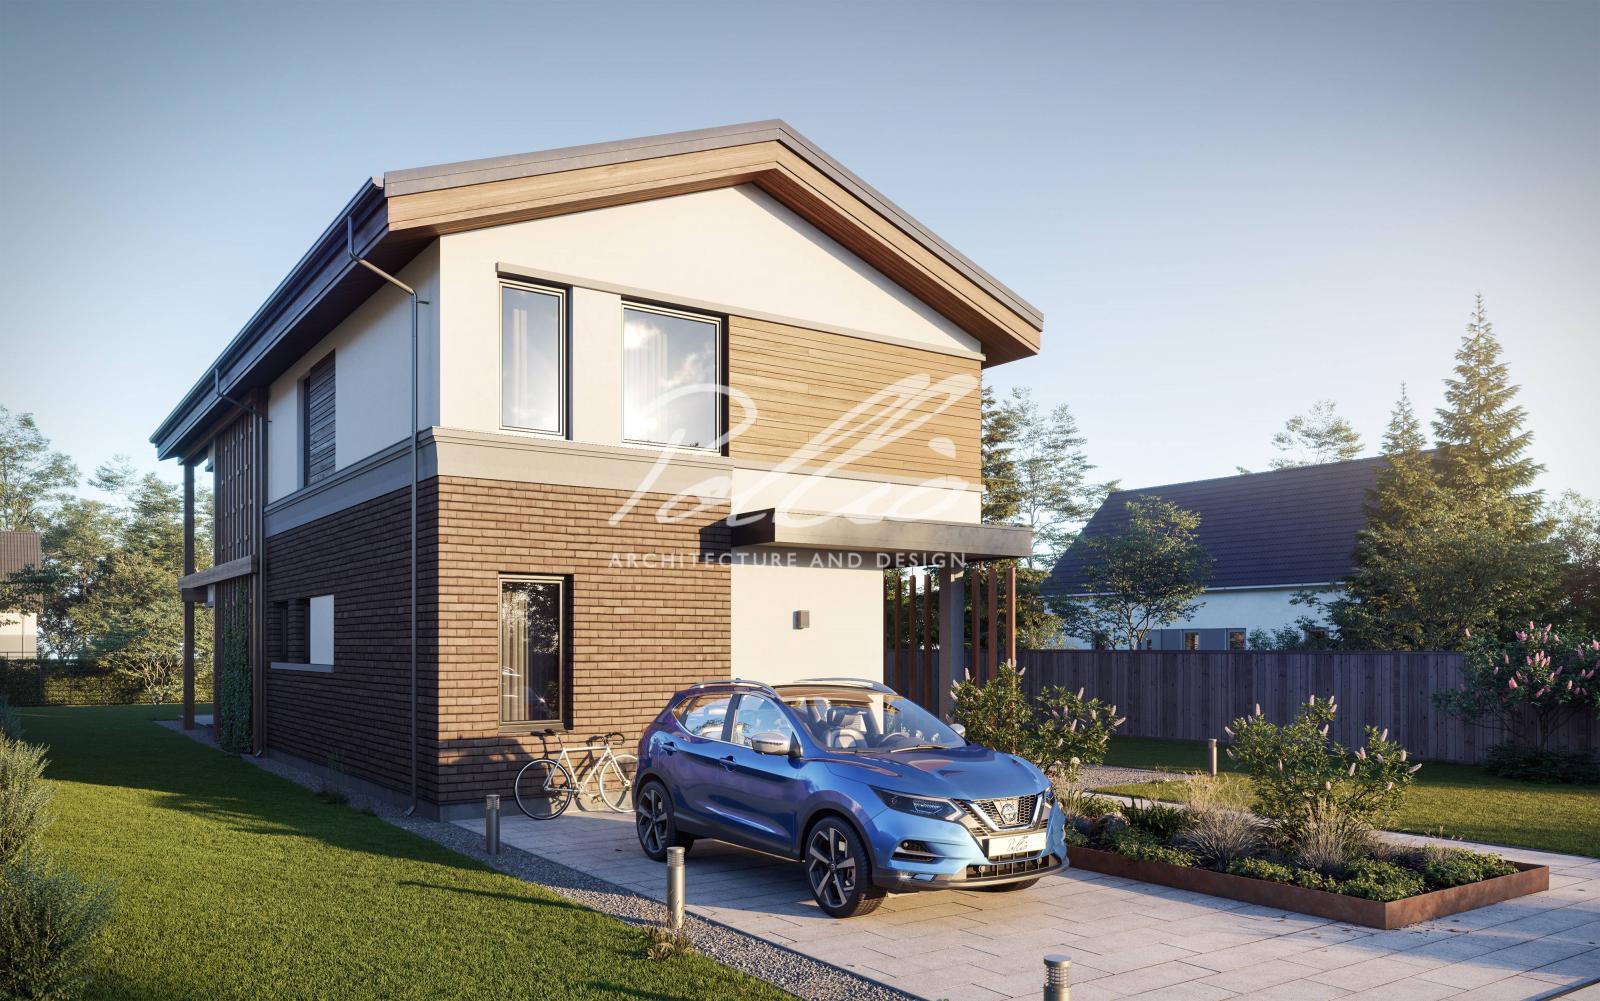 X25 Современный проект дома для узкого участка фото 2